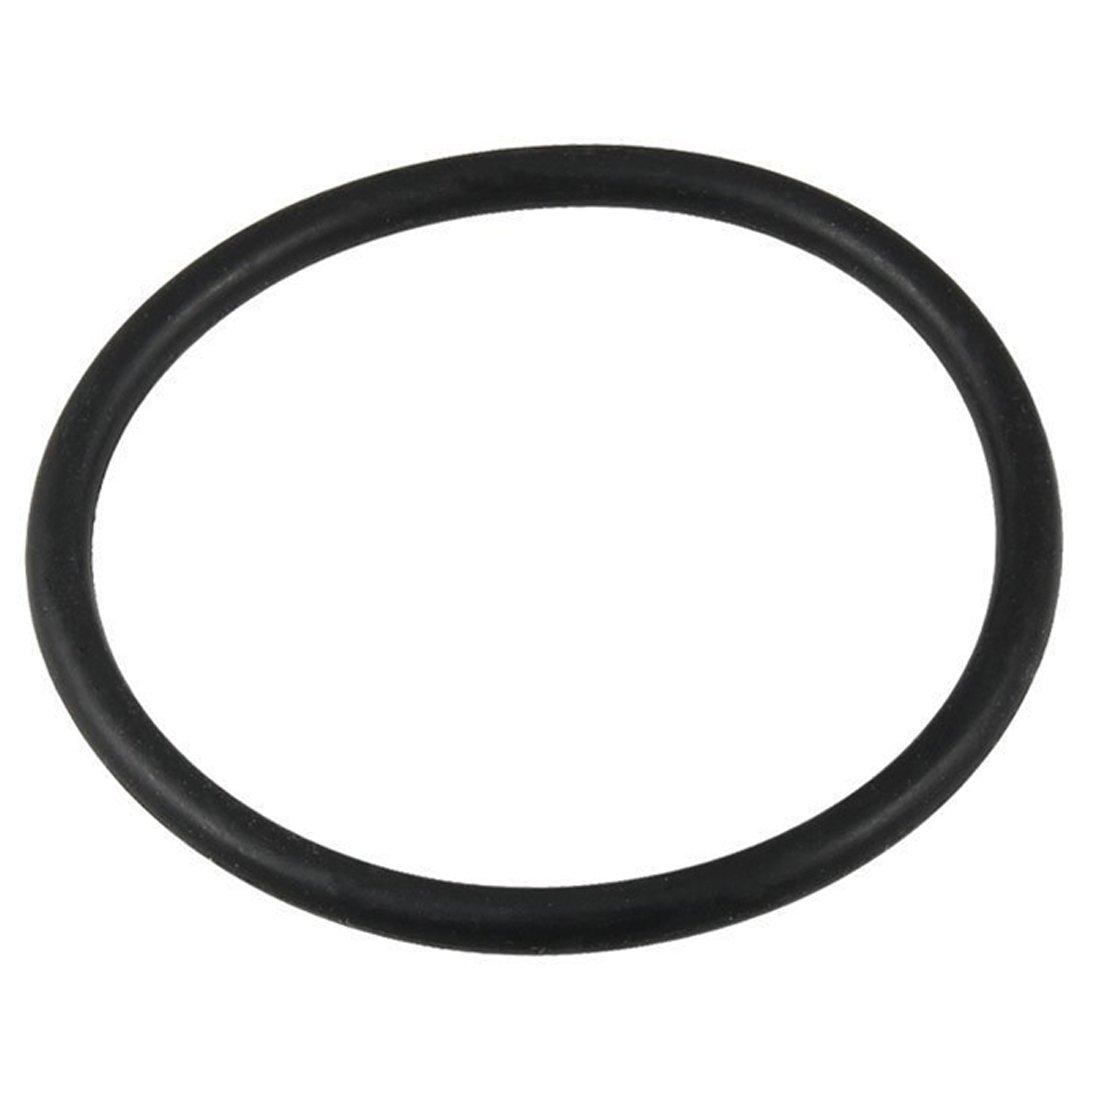 R 5 Stueck 53 mm x 3,5 mm x 46 mm Industriegummi O Ring Oil Seal Dichtungen SODIAL O-Ring-Dichtungen